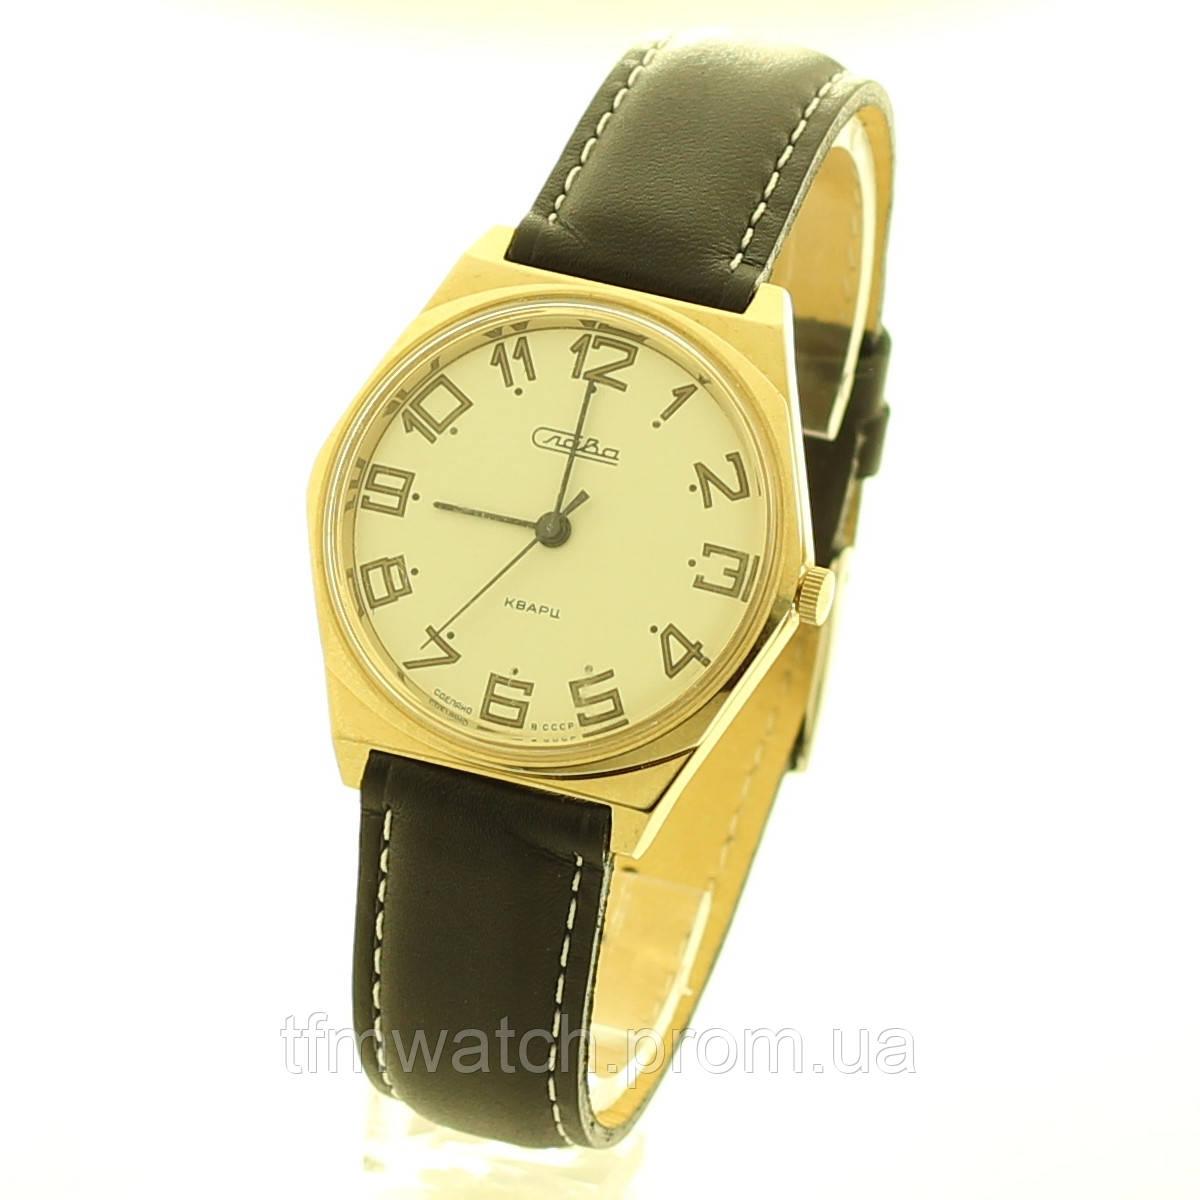 Слава Кварц часы СССР